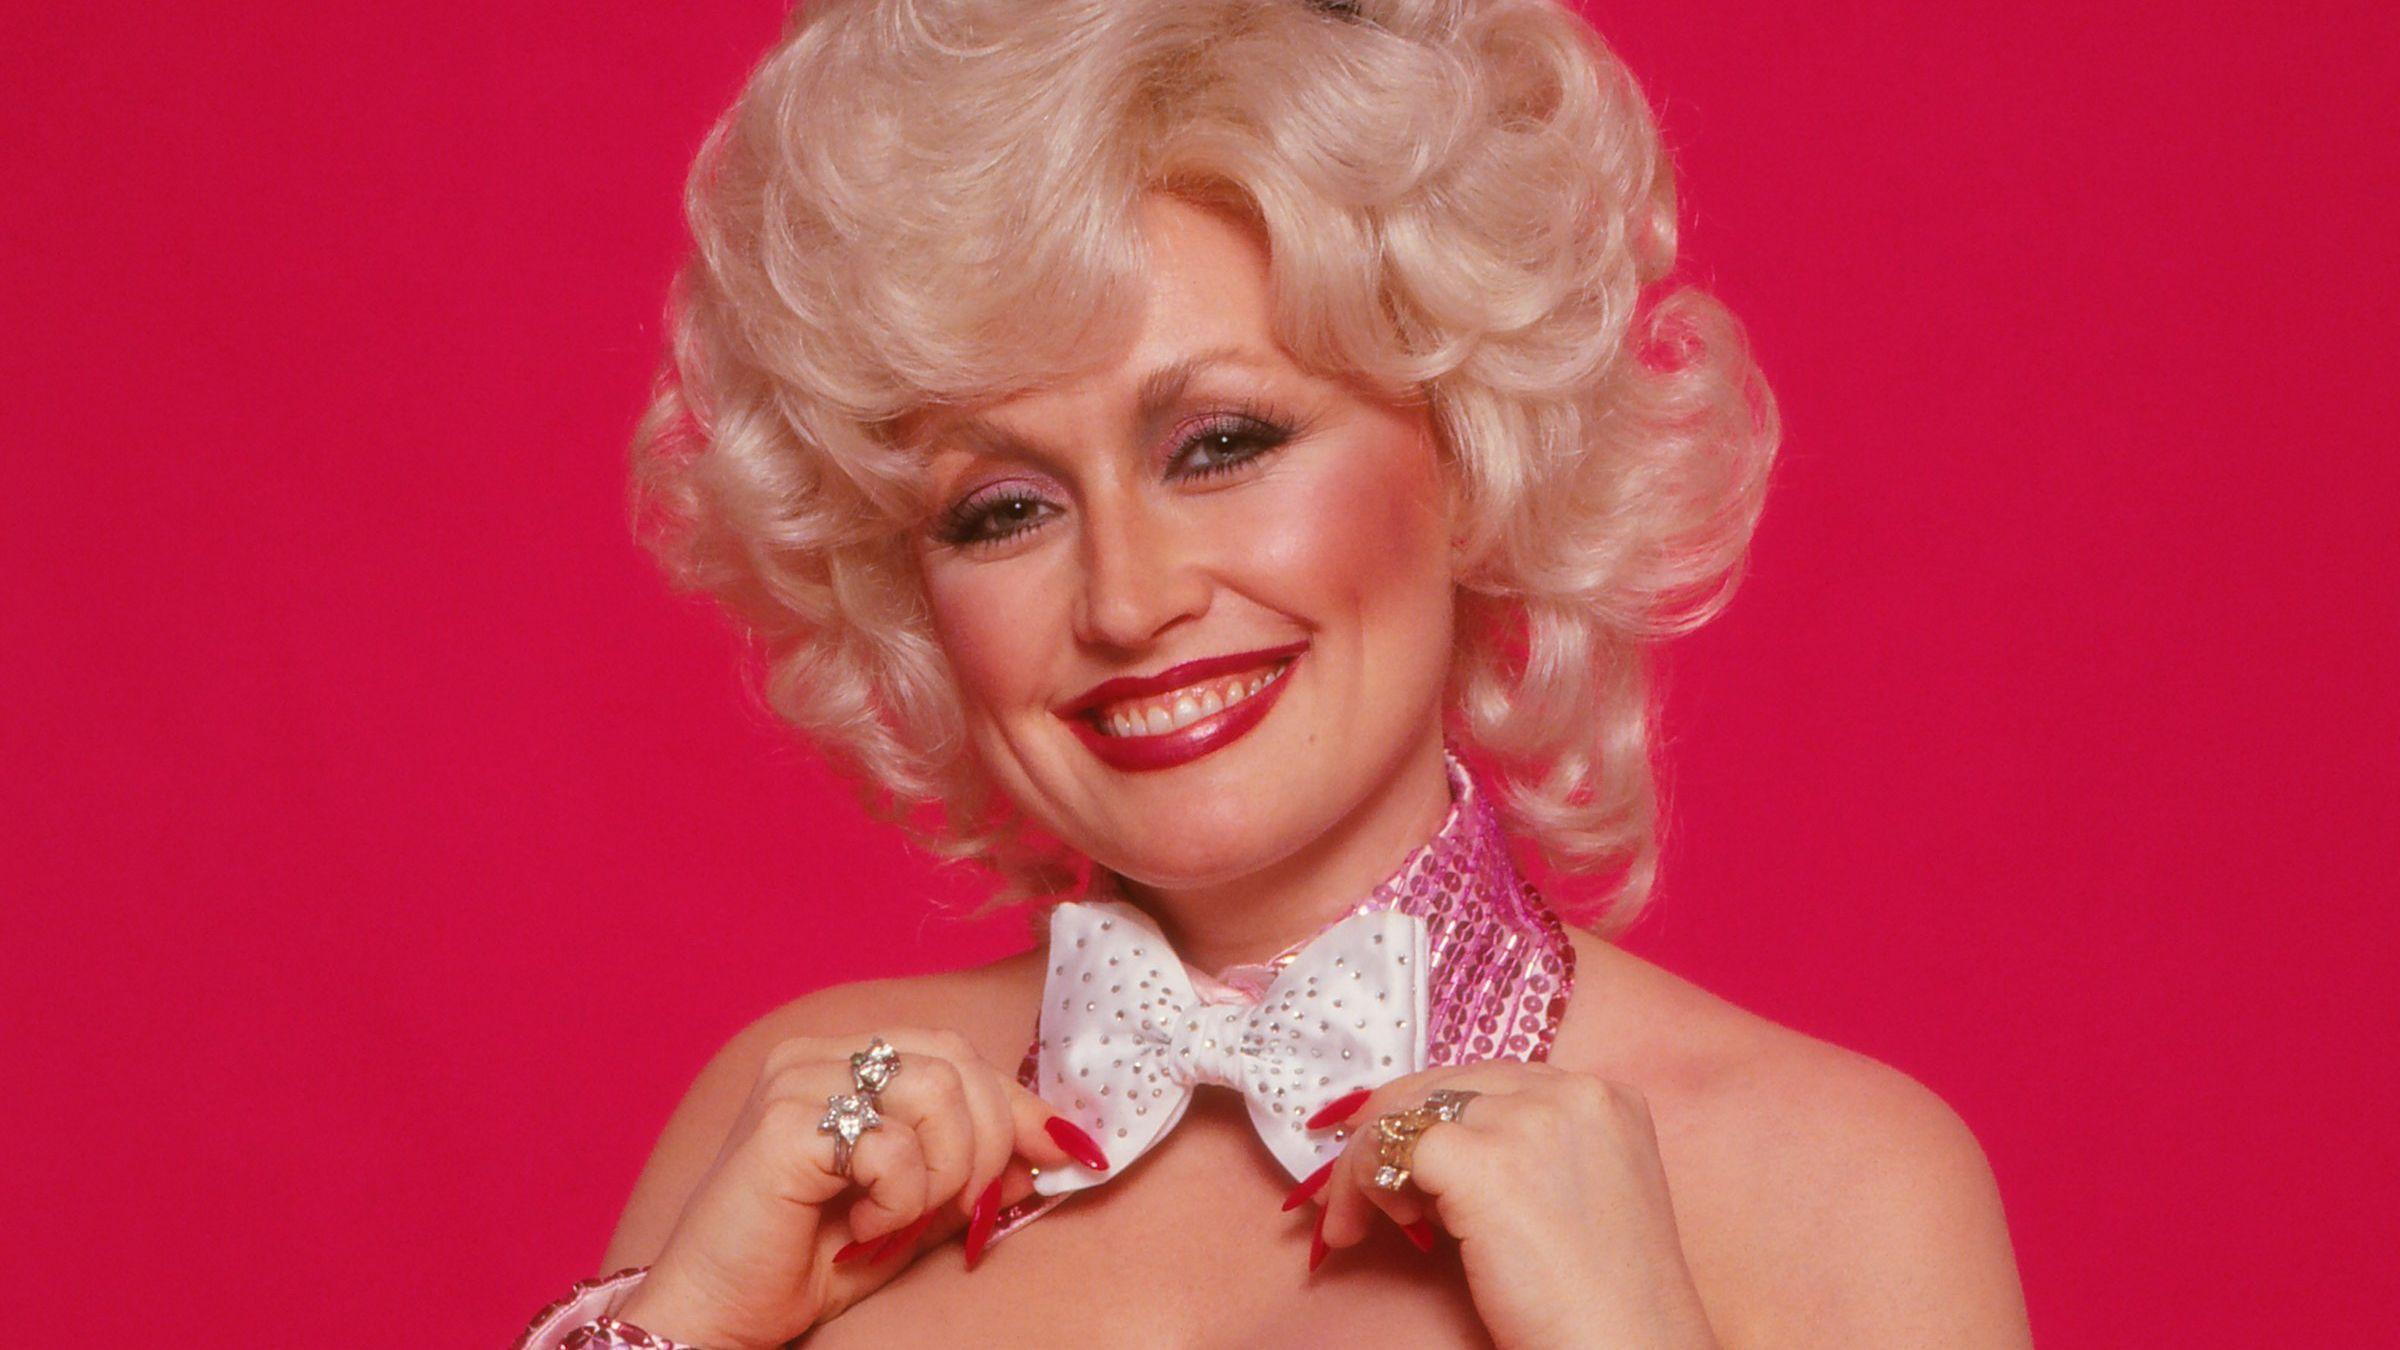 #DollyPartonChallenge: Confira alguns dos melhores memes